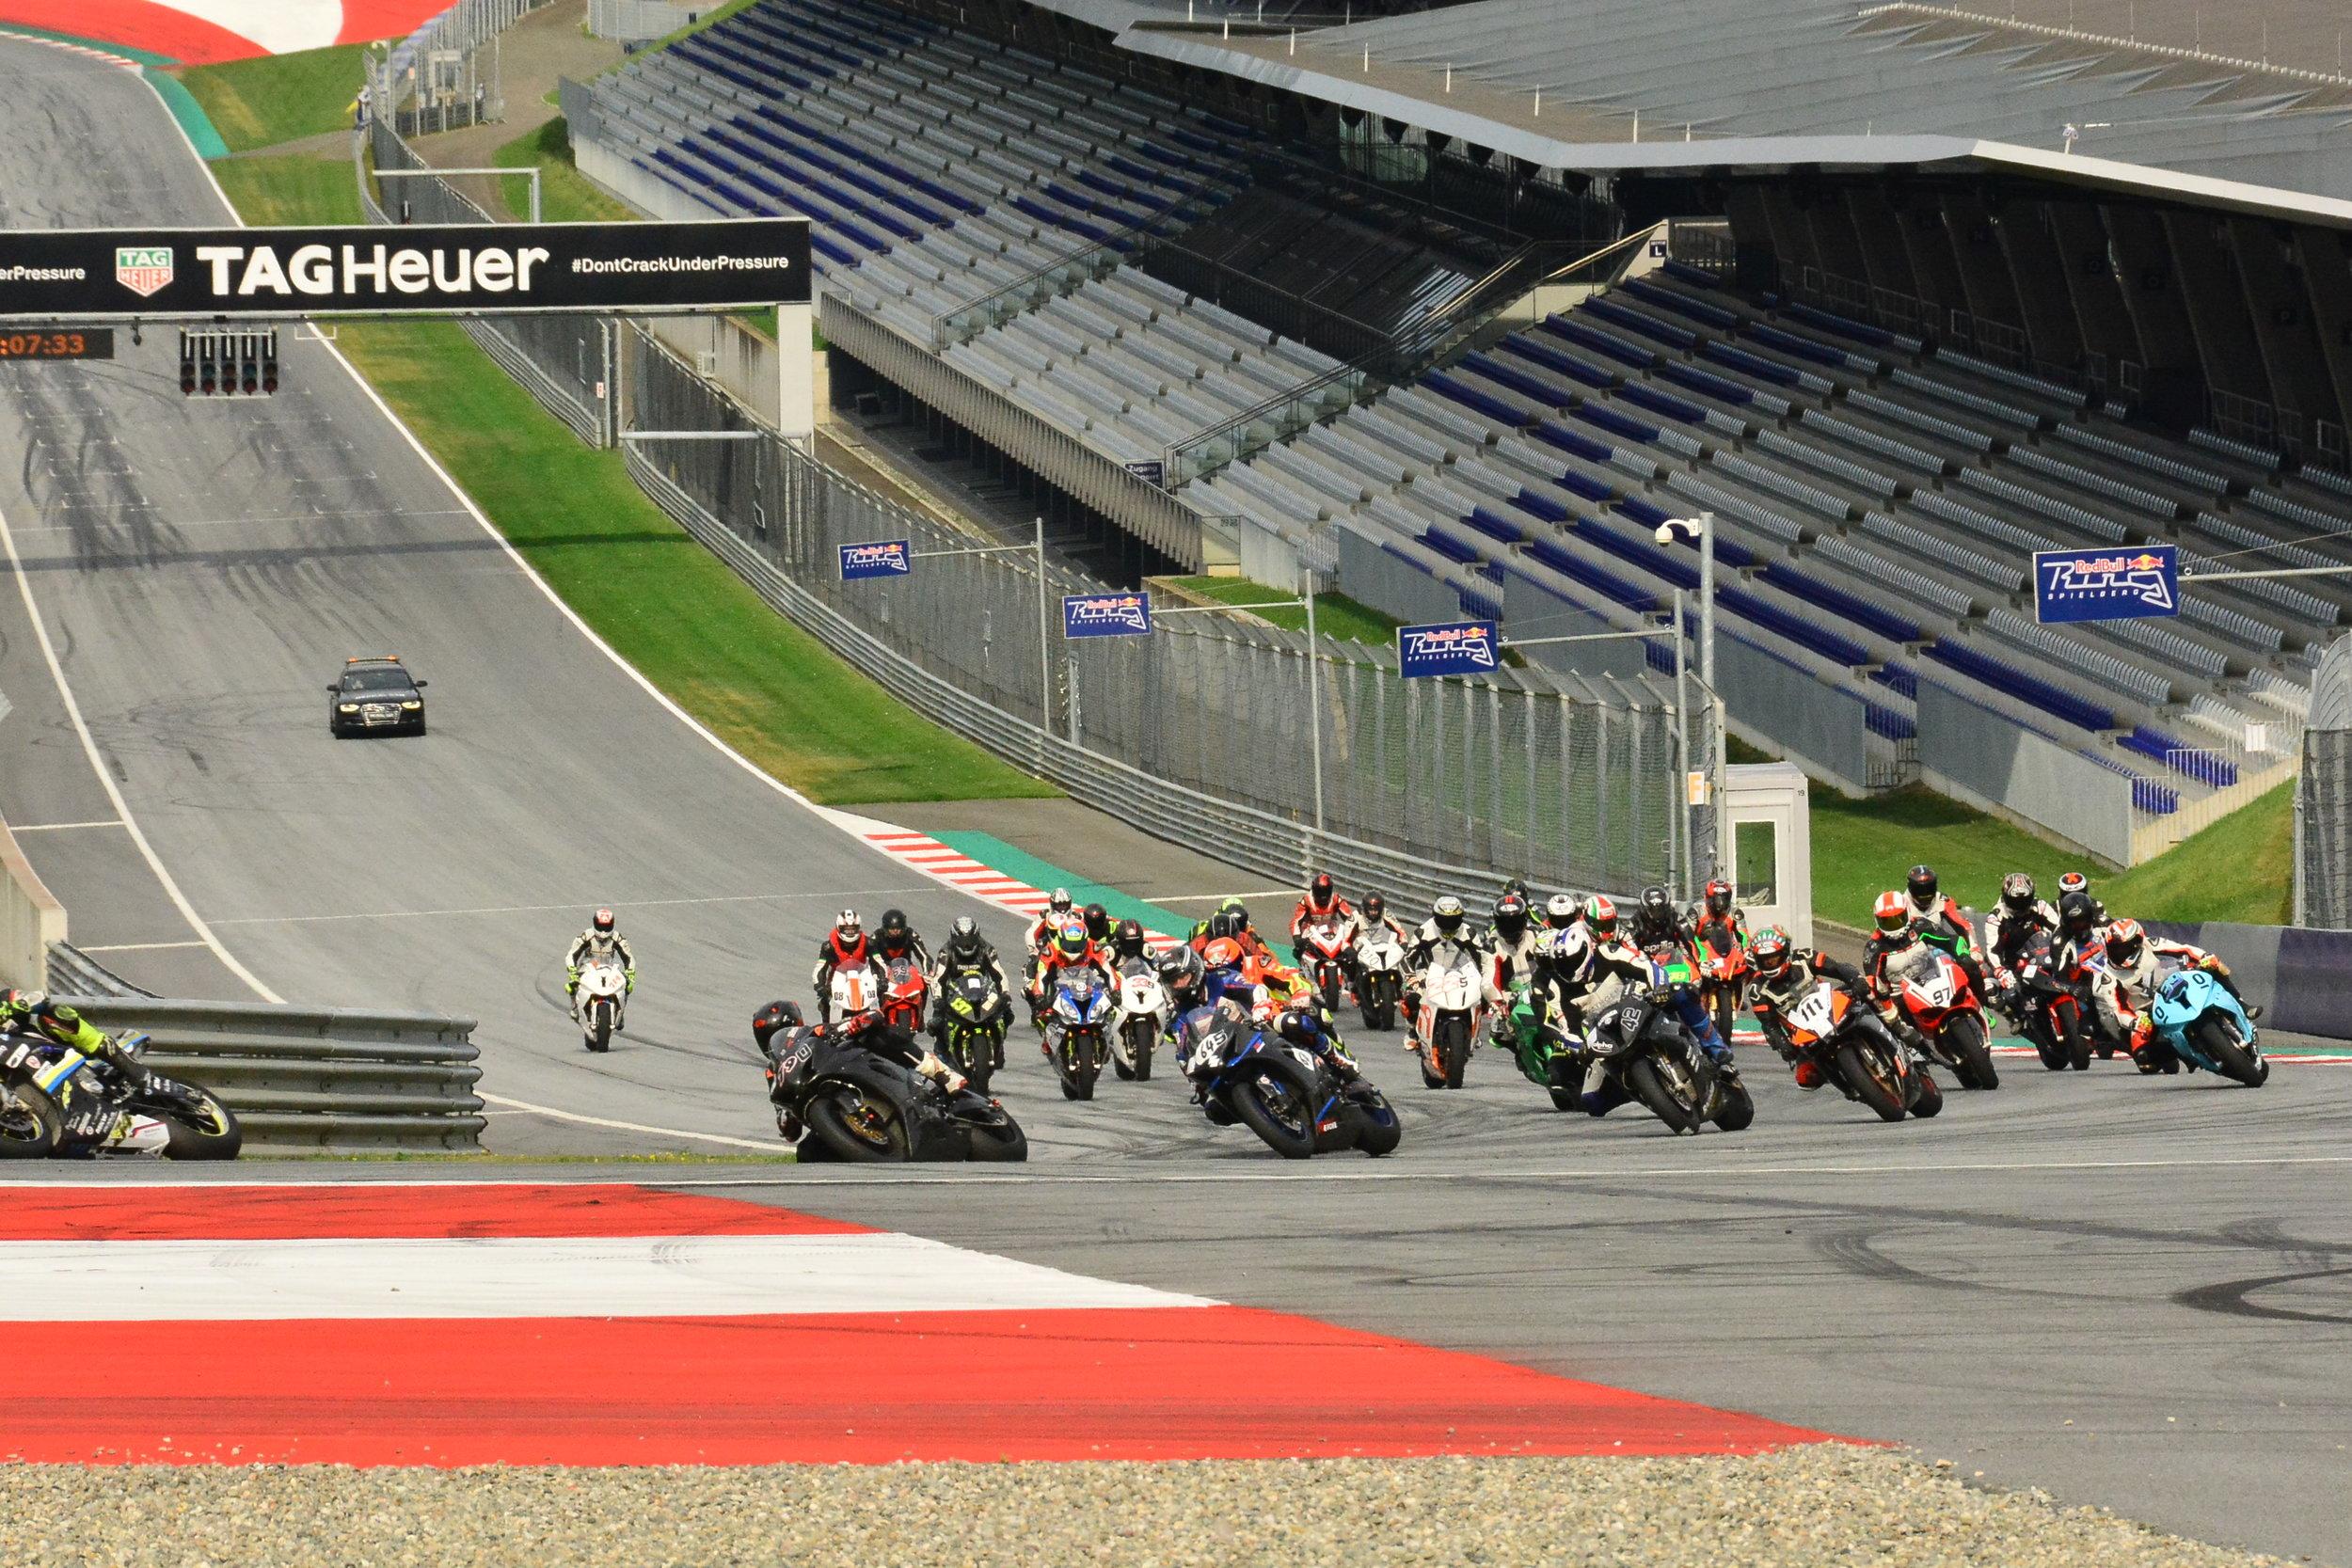 Race_1 (11).JPG